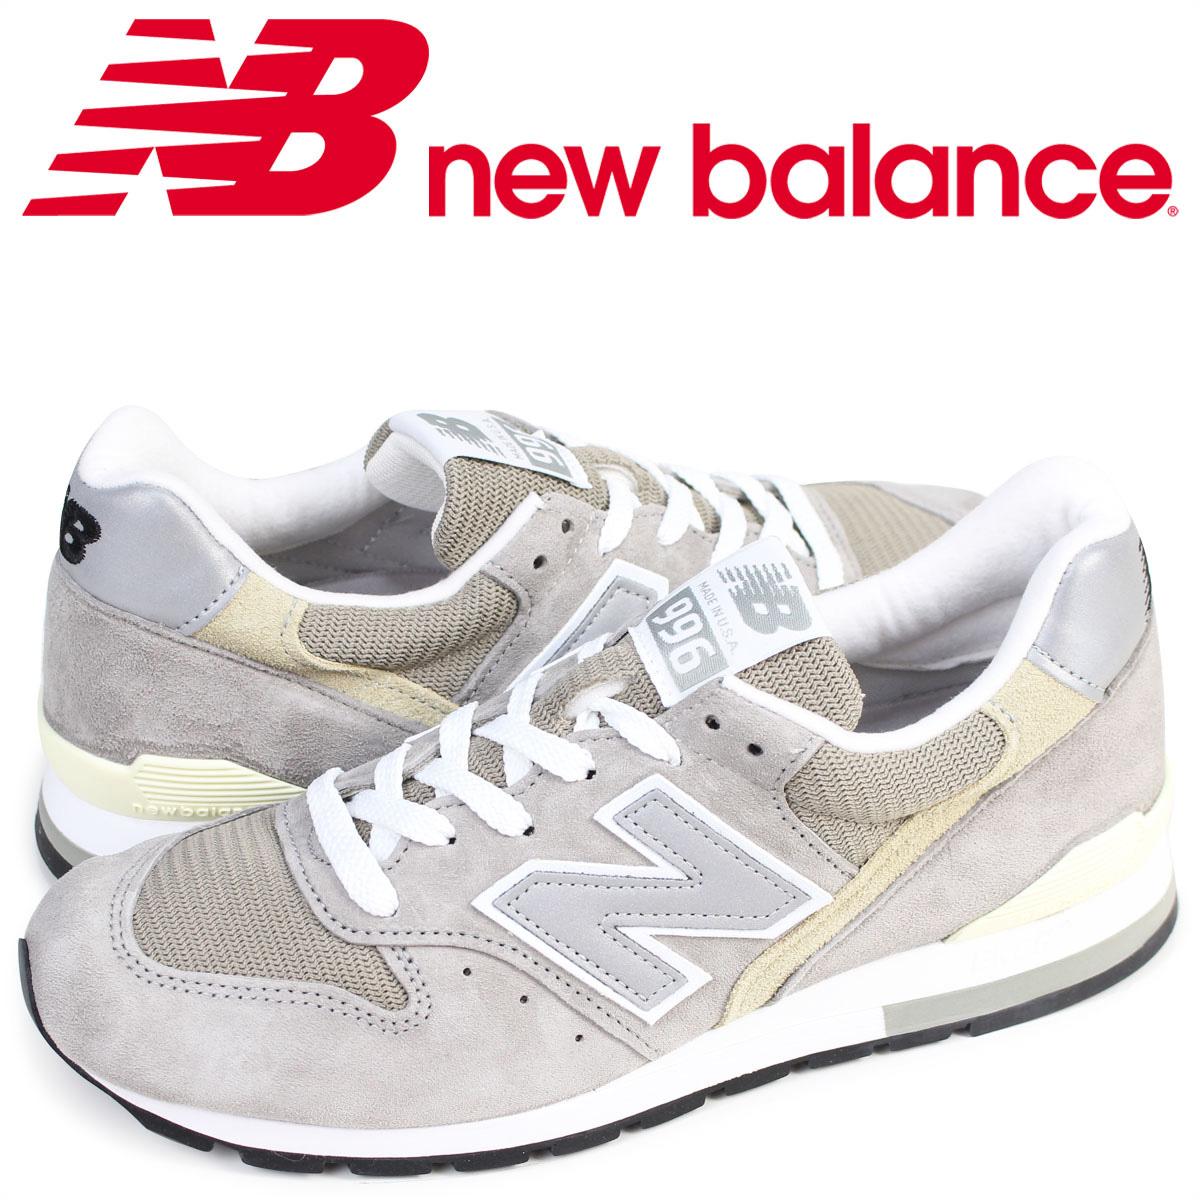 new balance core 996 beige